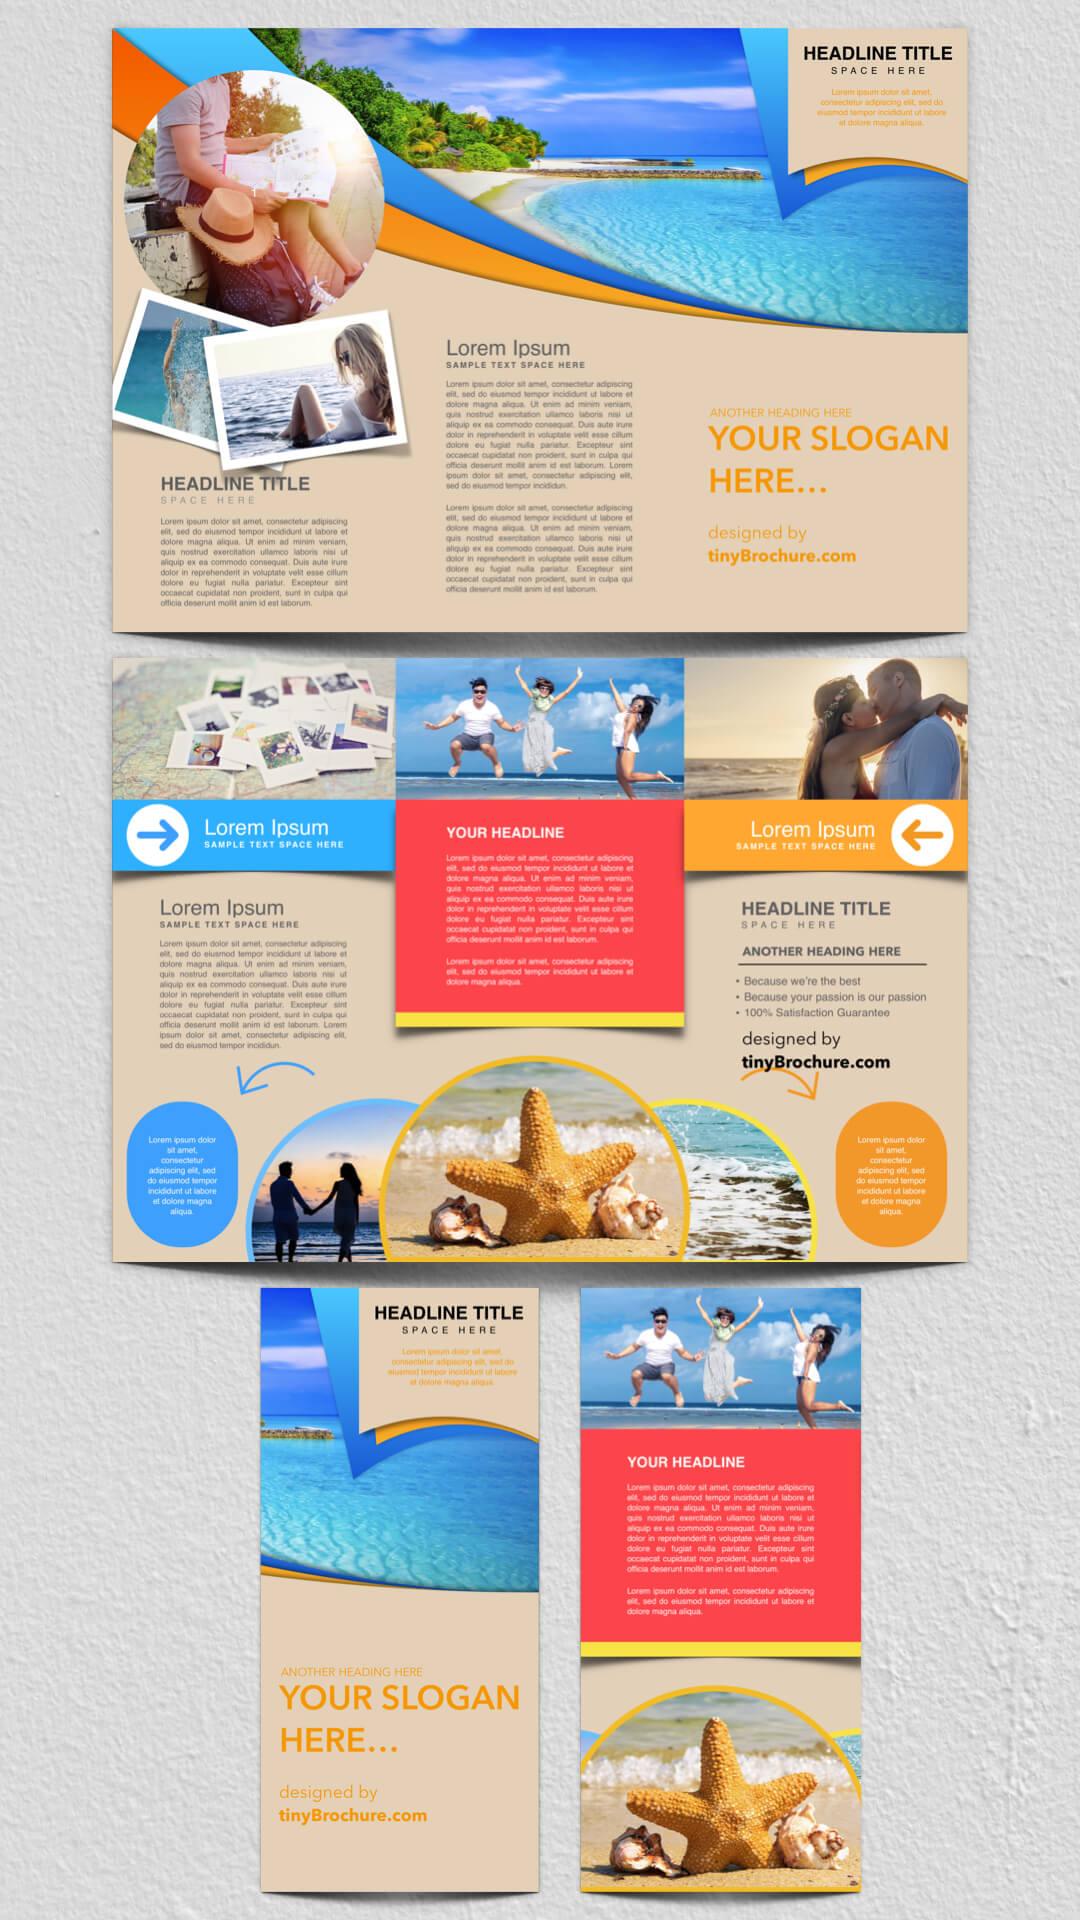 Travel Brochure Template Google Docs | Graphic Design Intended For Travel Brochure Template Google Docs